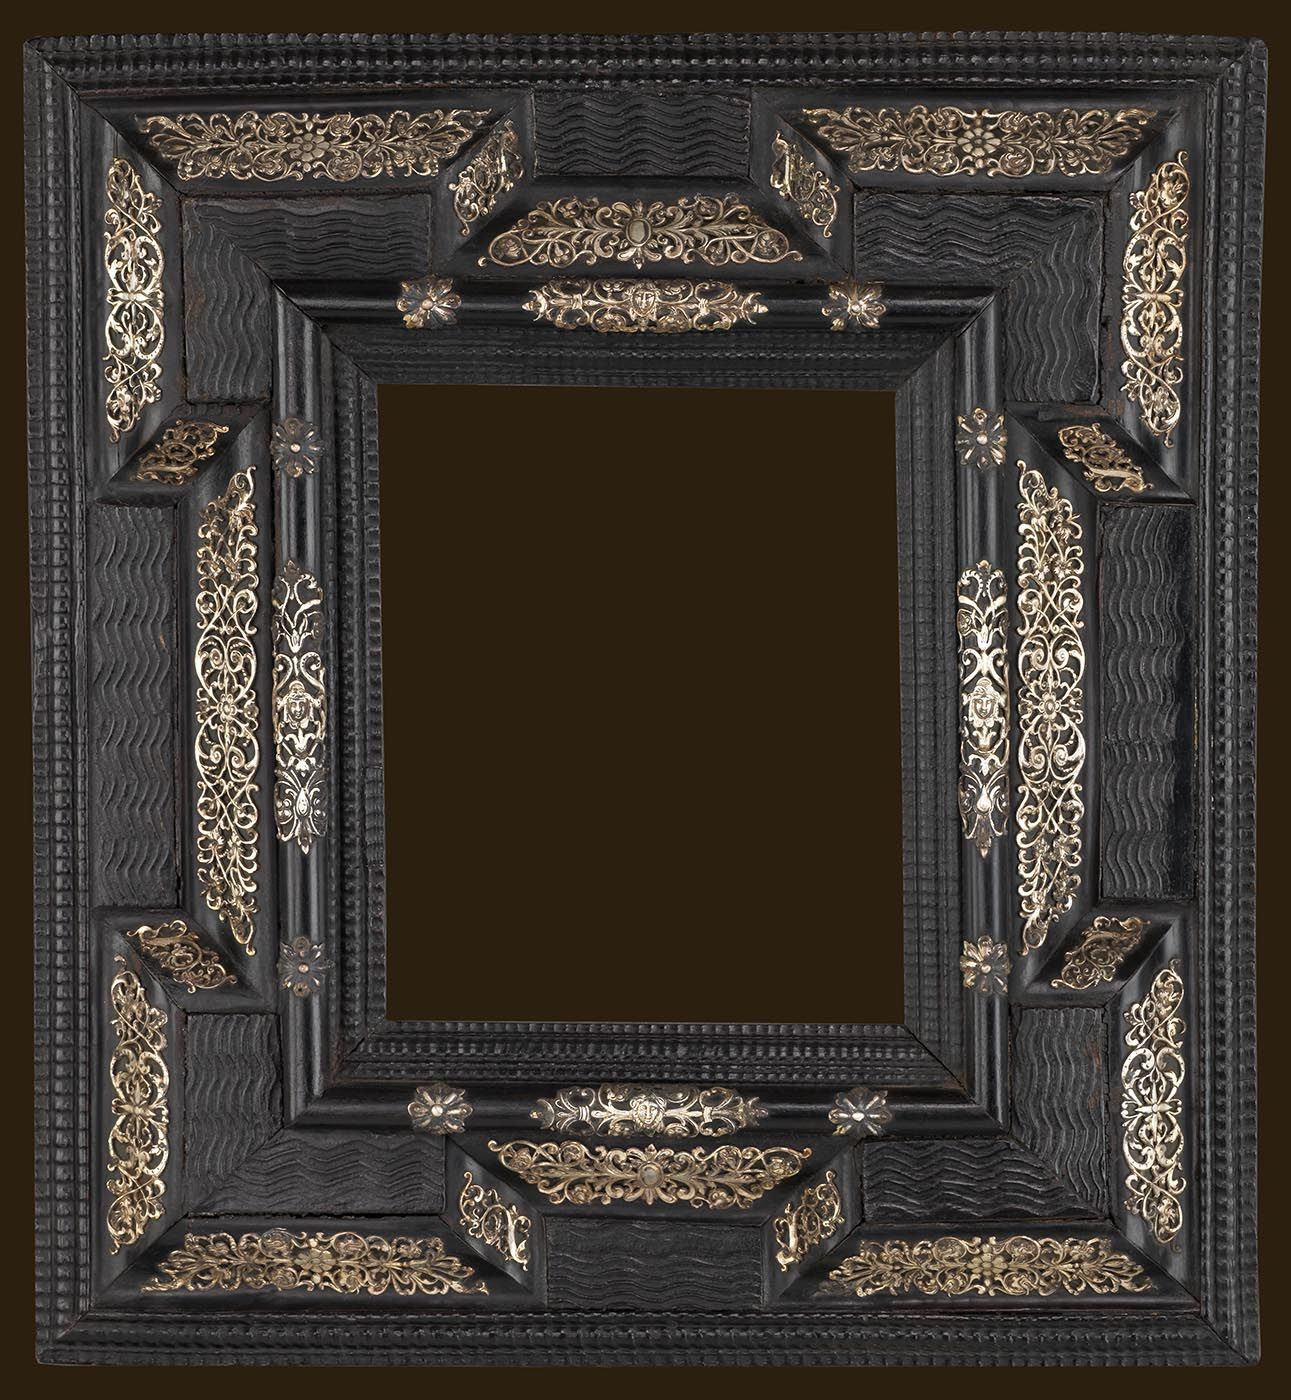 Dutch 17th century 10 x 8 x 5 diego salazar antique frames dutch 17th century 10 x 8 jeuxipadfo Gallery